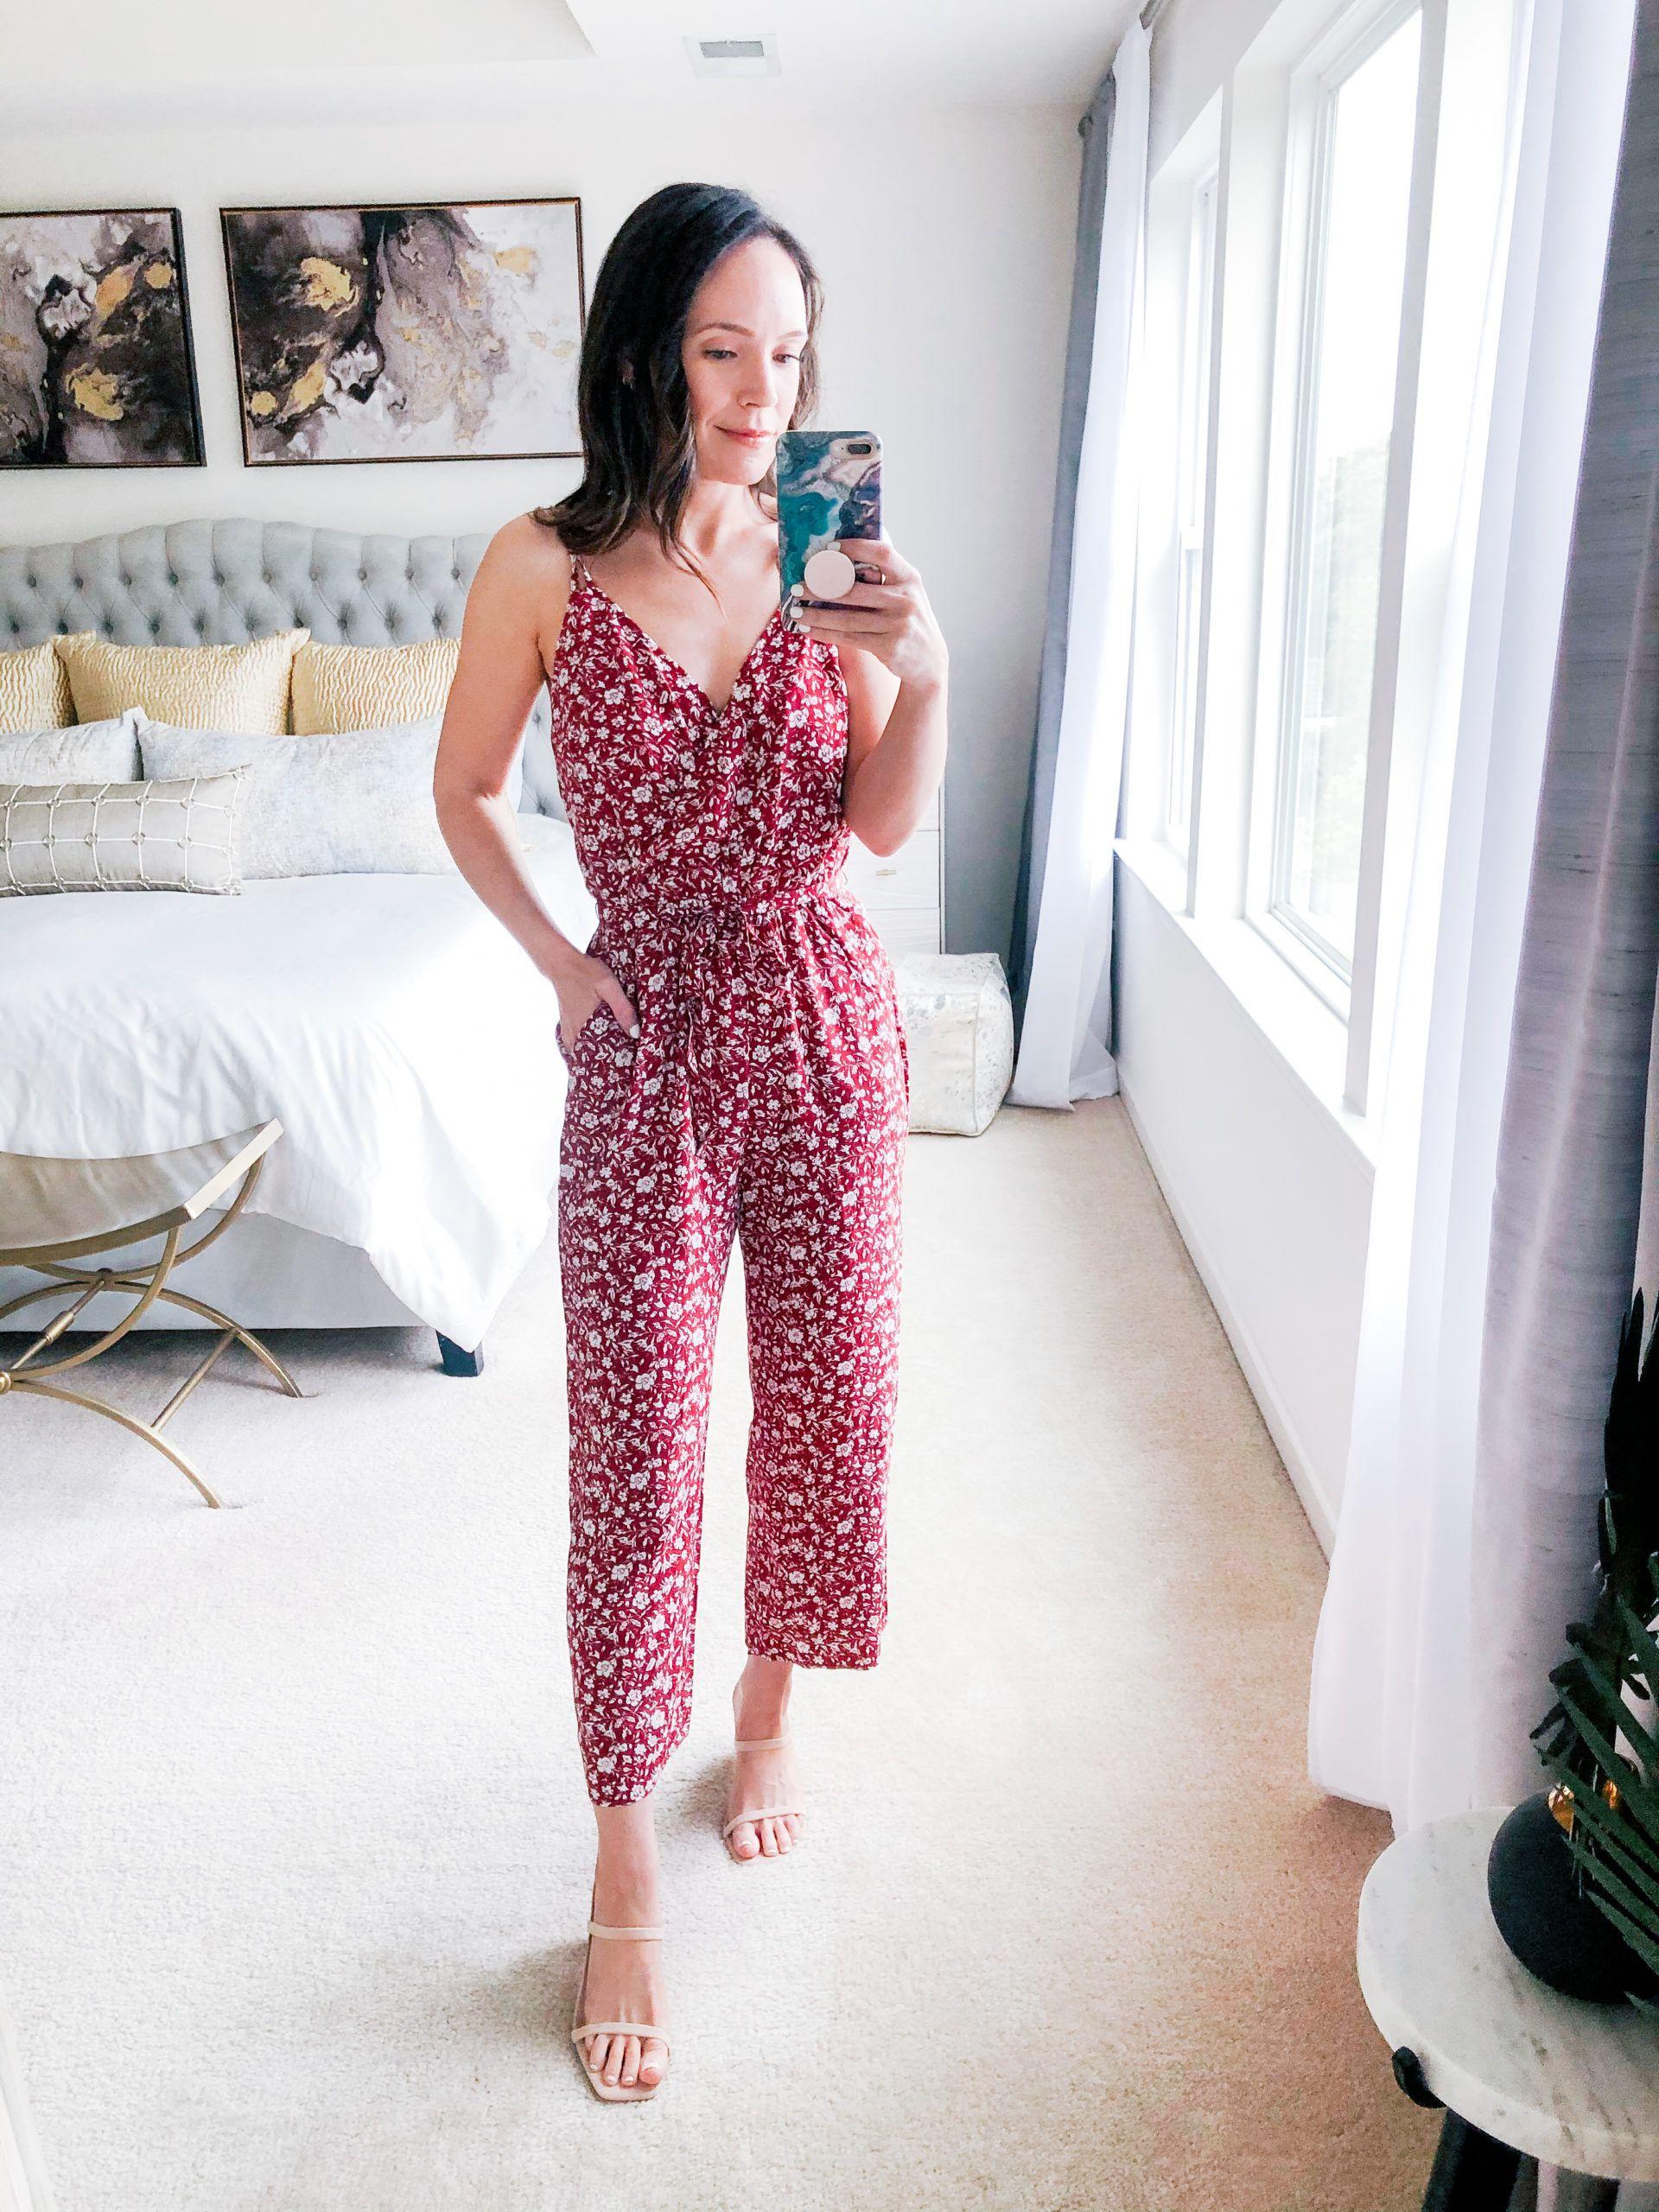 Summer Abercrombie Haul Alittlebitetc Amazon Dresses Jumpsuit Fashion Loungewear Set [ 2560 x 1920 Pixel ]